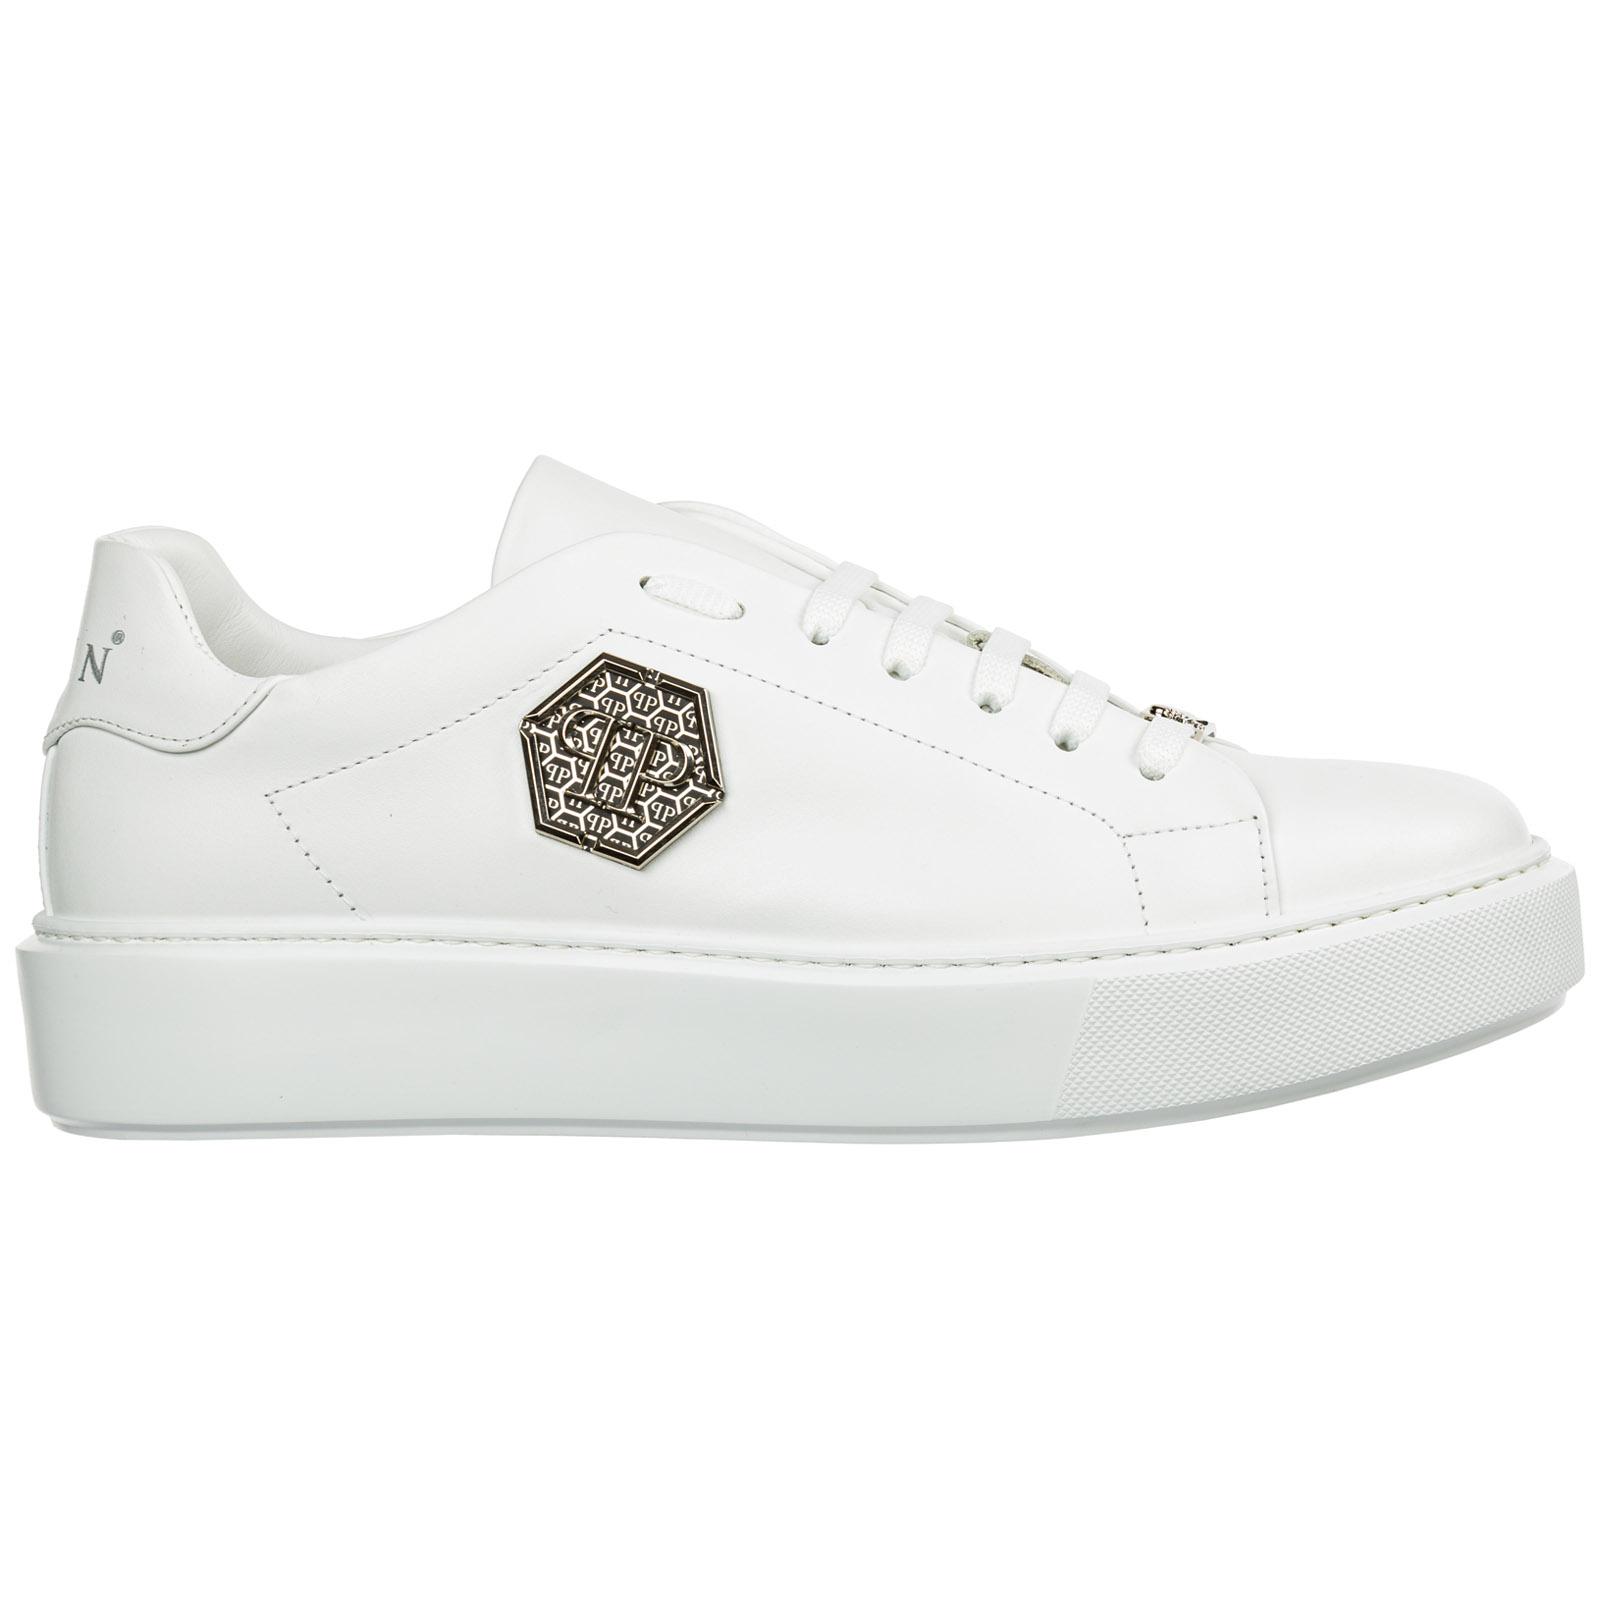 reputable site fafee 9f1b9 Scarpe sneakers uomo in pelle